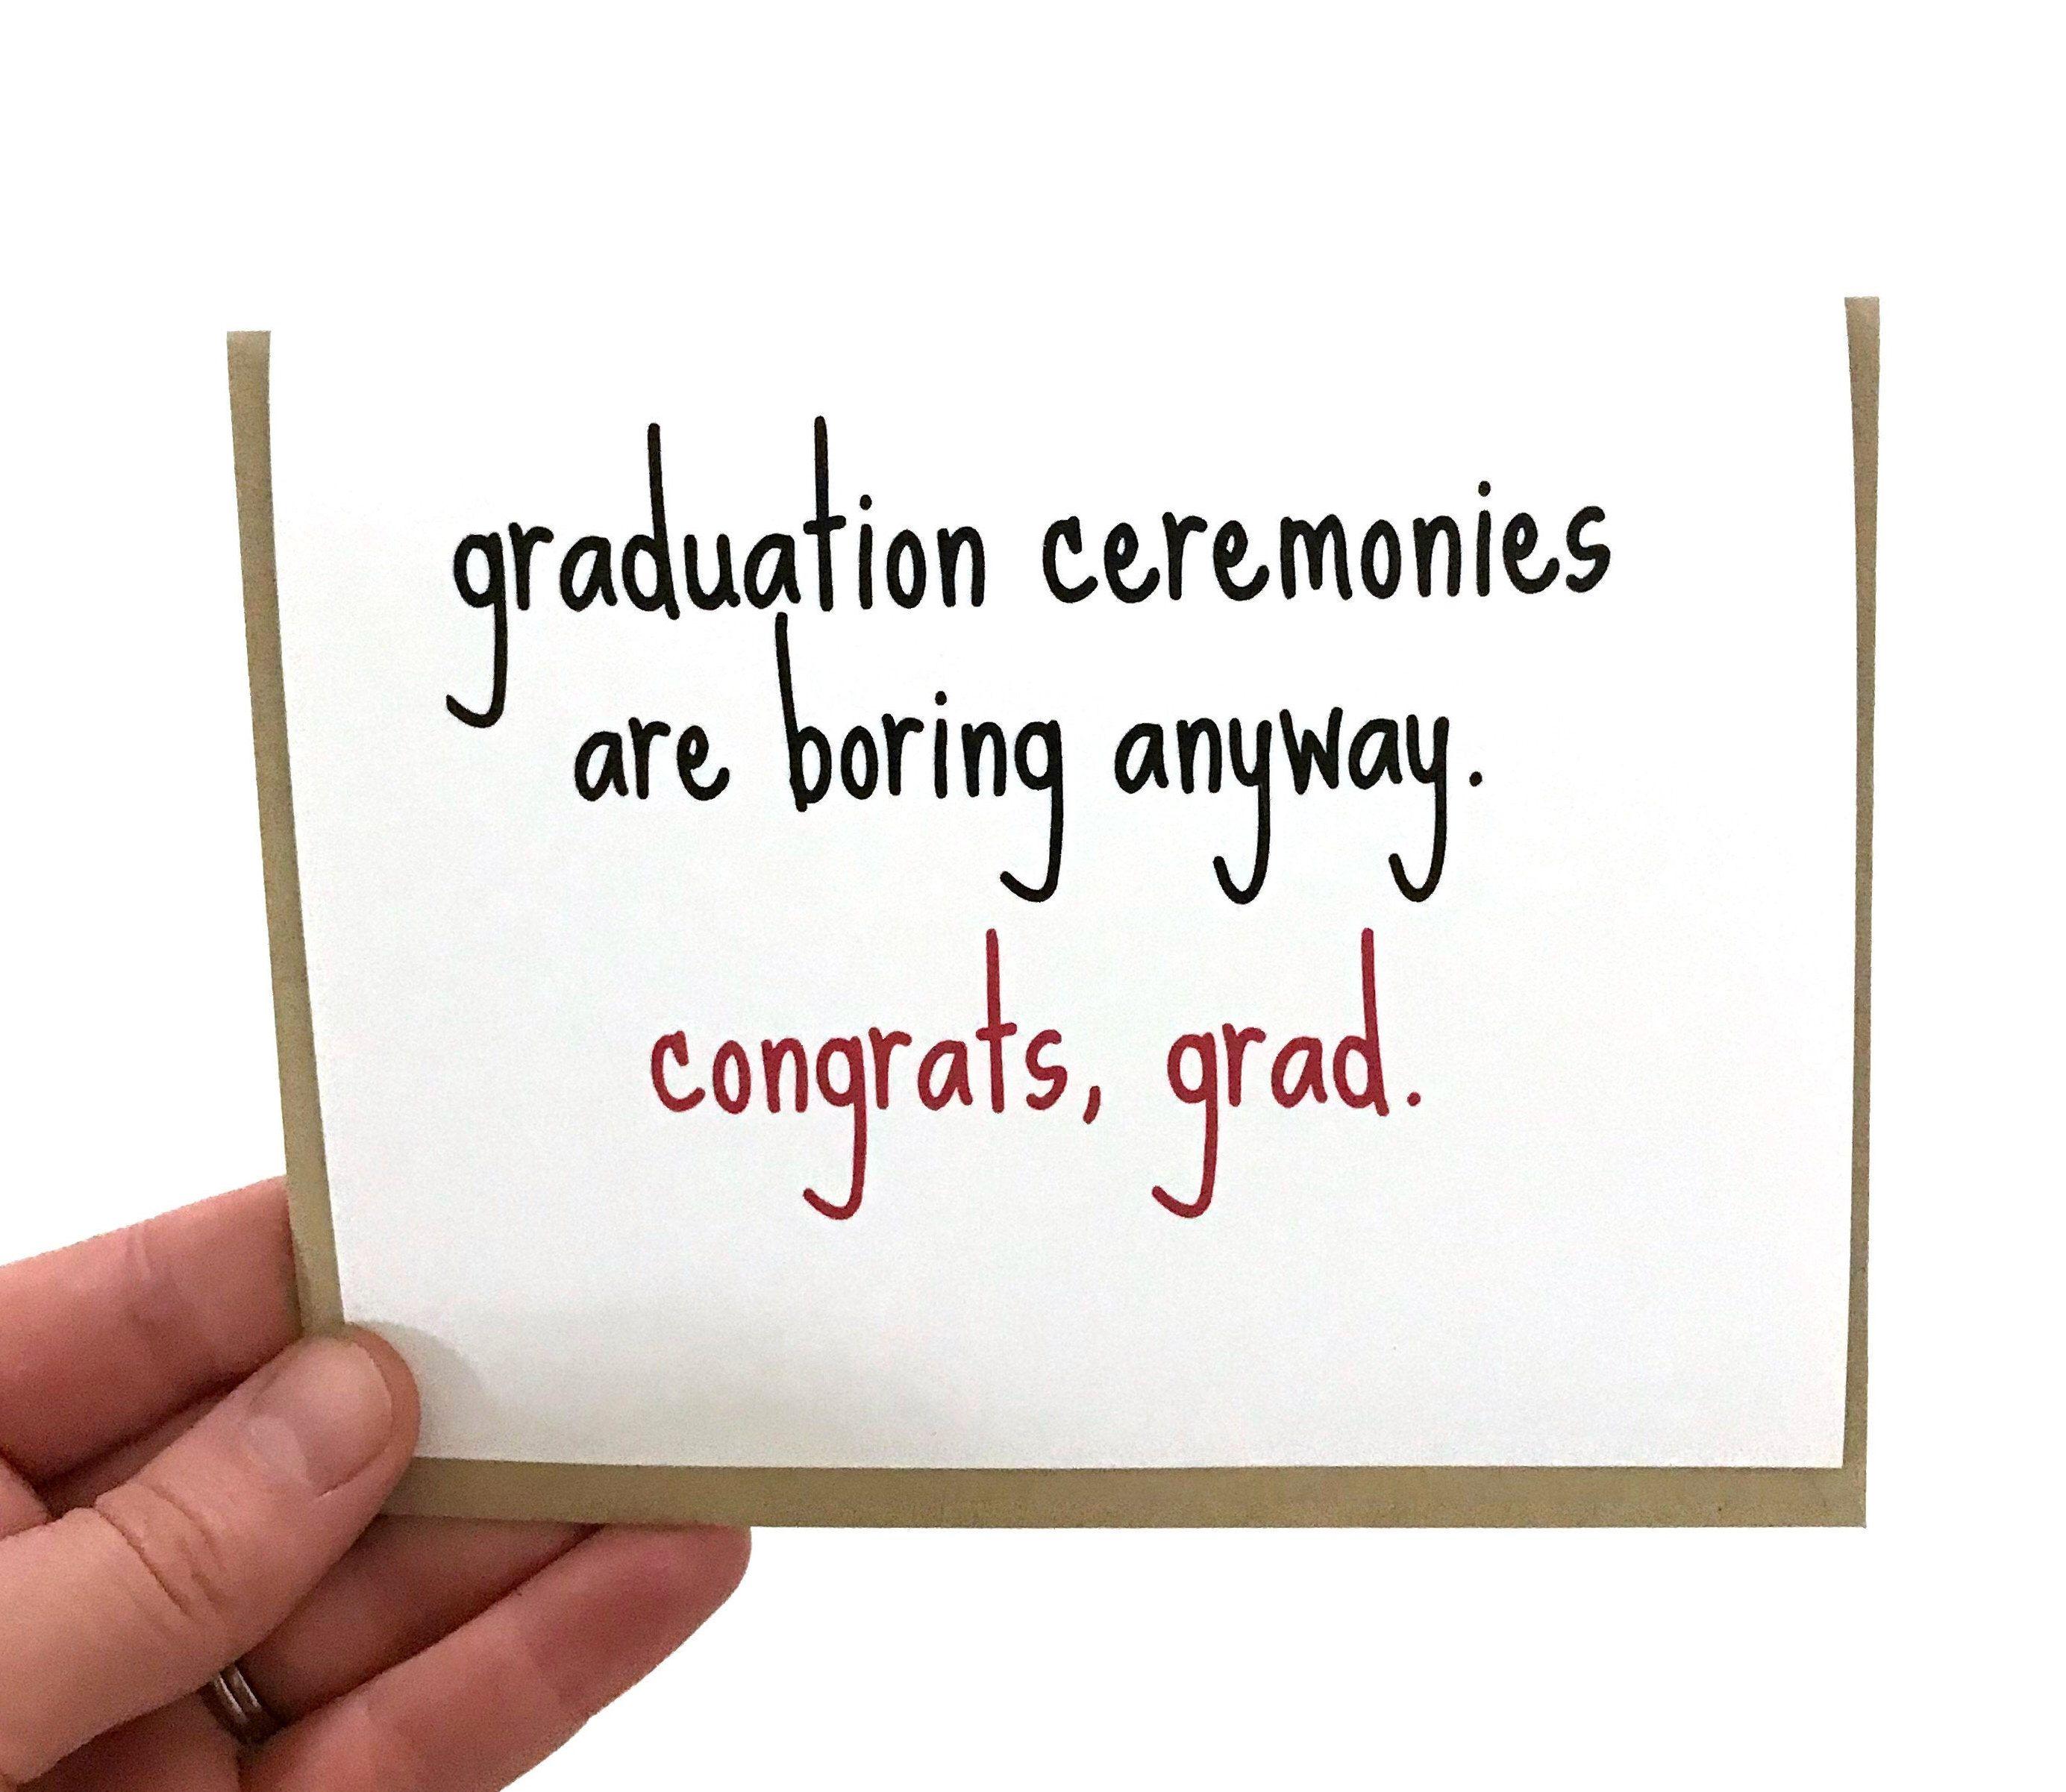 Graduate 2020 Class Of 2020 Graduation Card Cancelled Graduation Seniors 2020 Social Distance Graduation Virtual Graduation In 2021 Graduation Card Sayings Funny Graduation Cards Graduation Signs